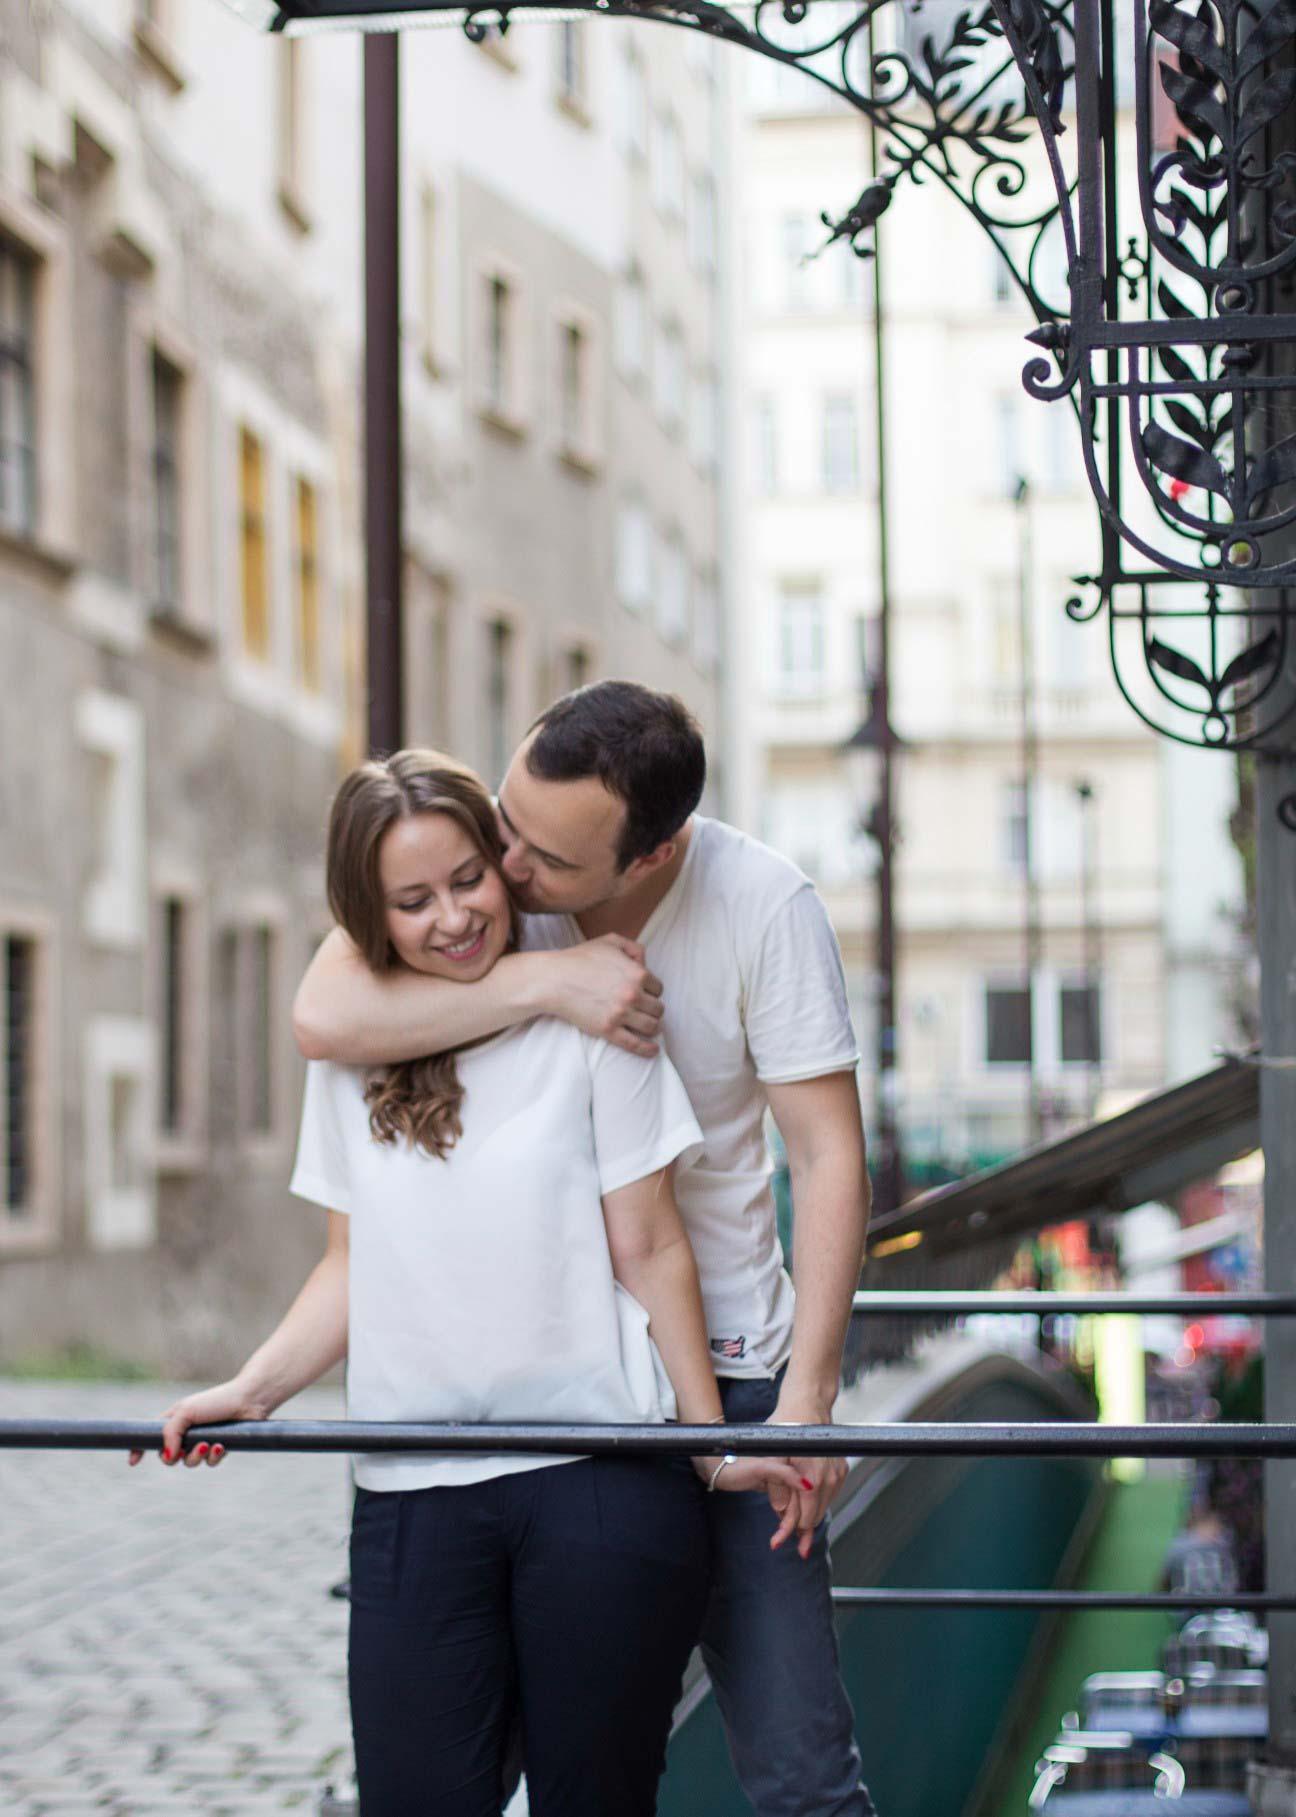 Verlobung fotograf Wien